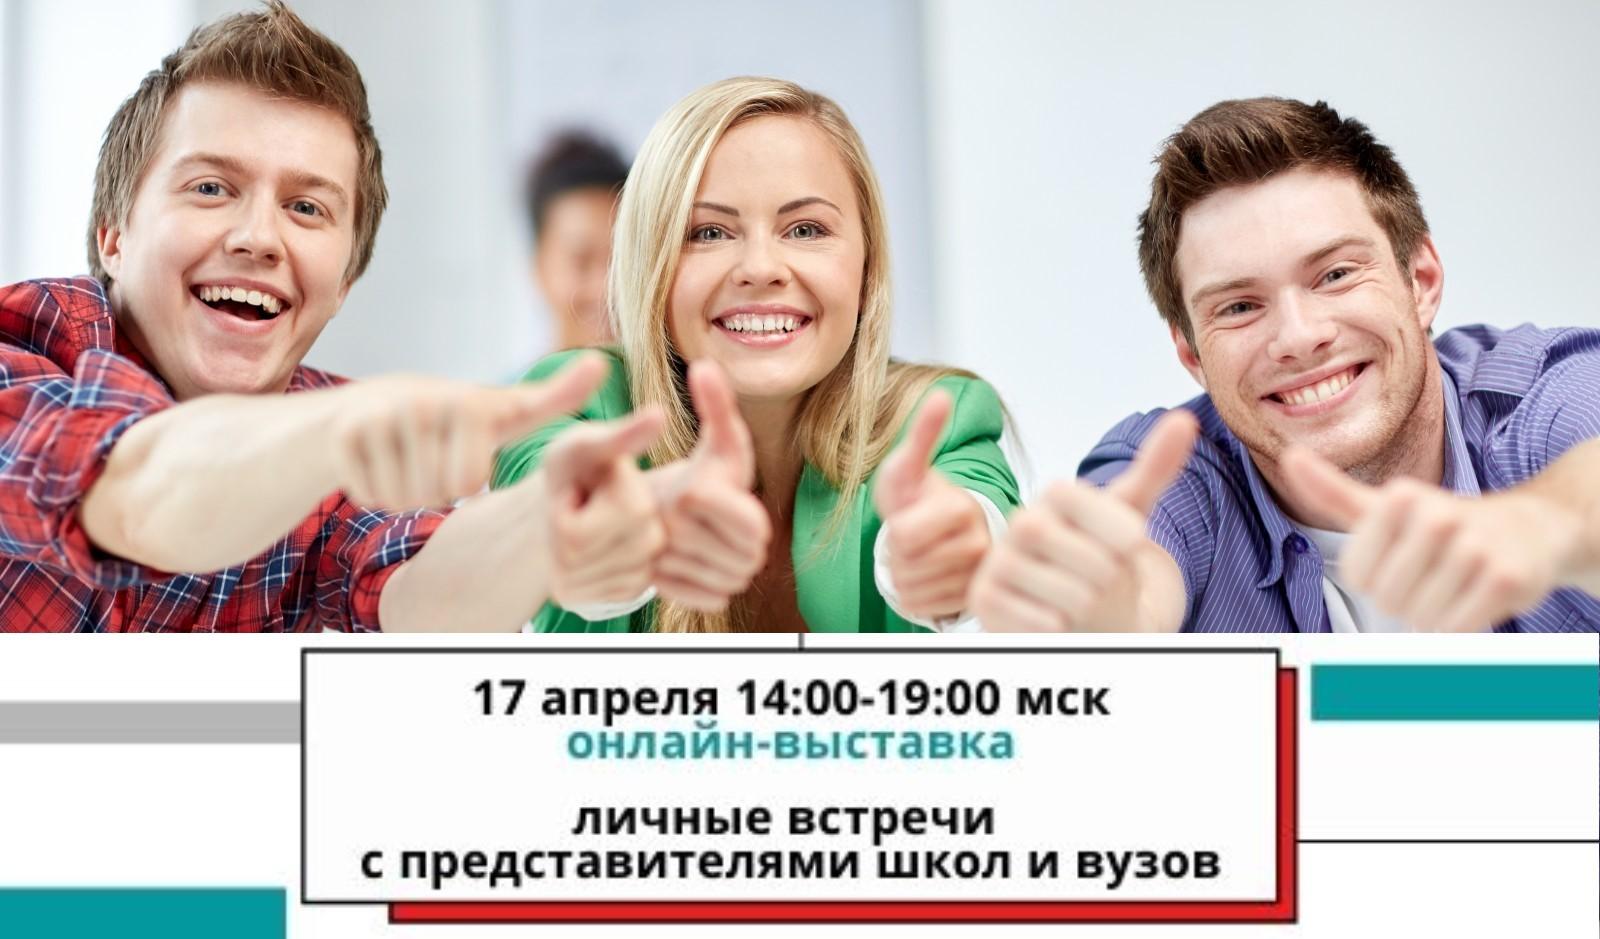 Онлайн-выставка 17 апреля 2021 года